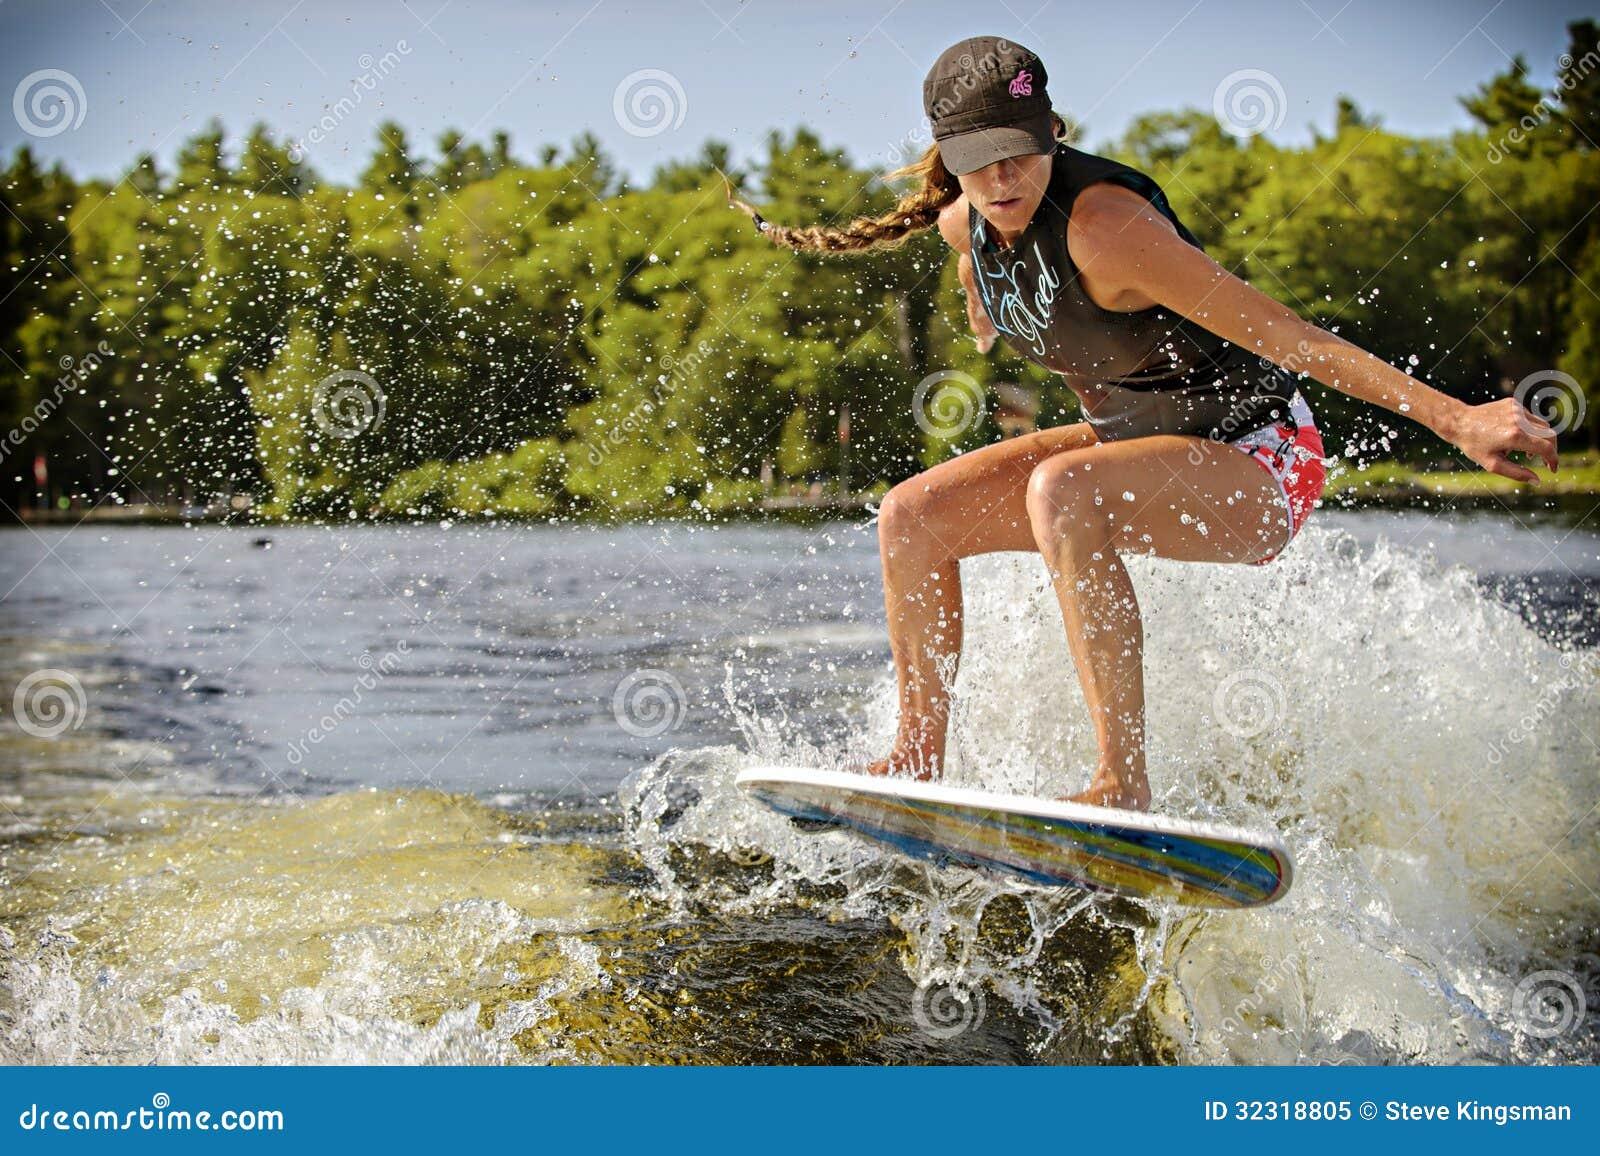 how to start wake surfing